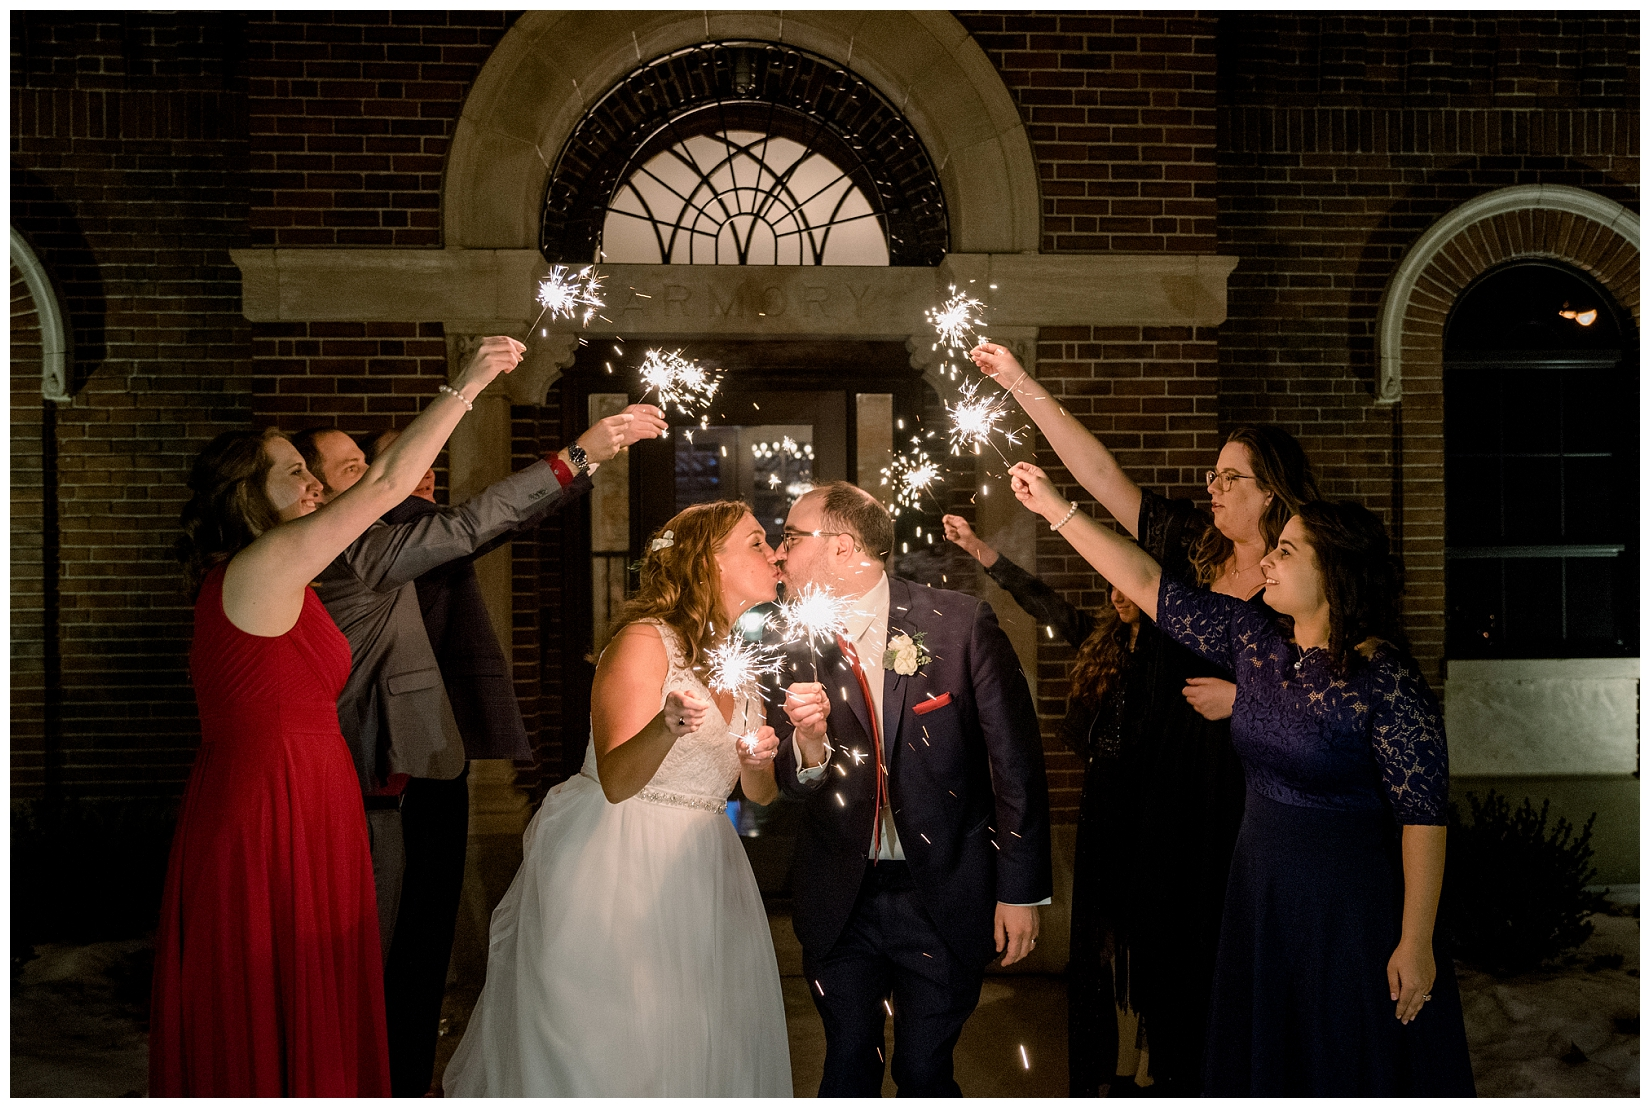 cat-alkire-wedding-photographer-indiana-chicago-indianapolis-fort-wayne_1017.jpg